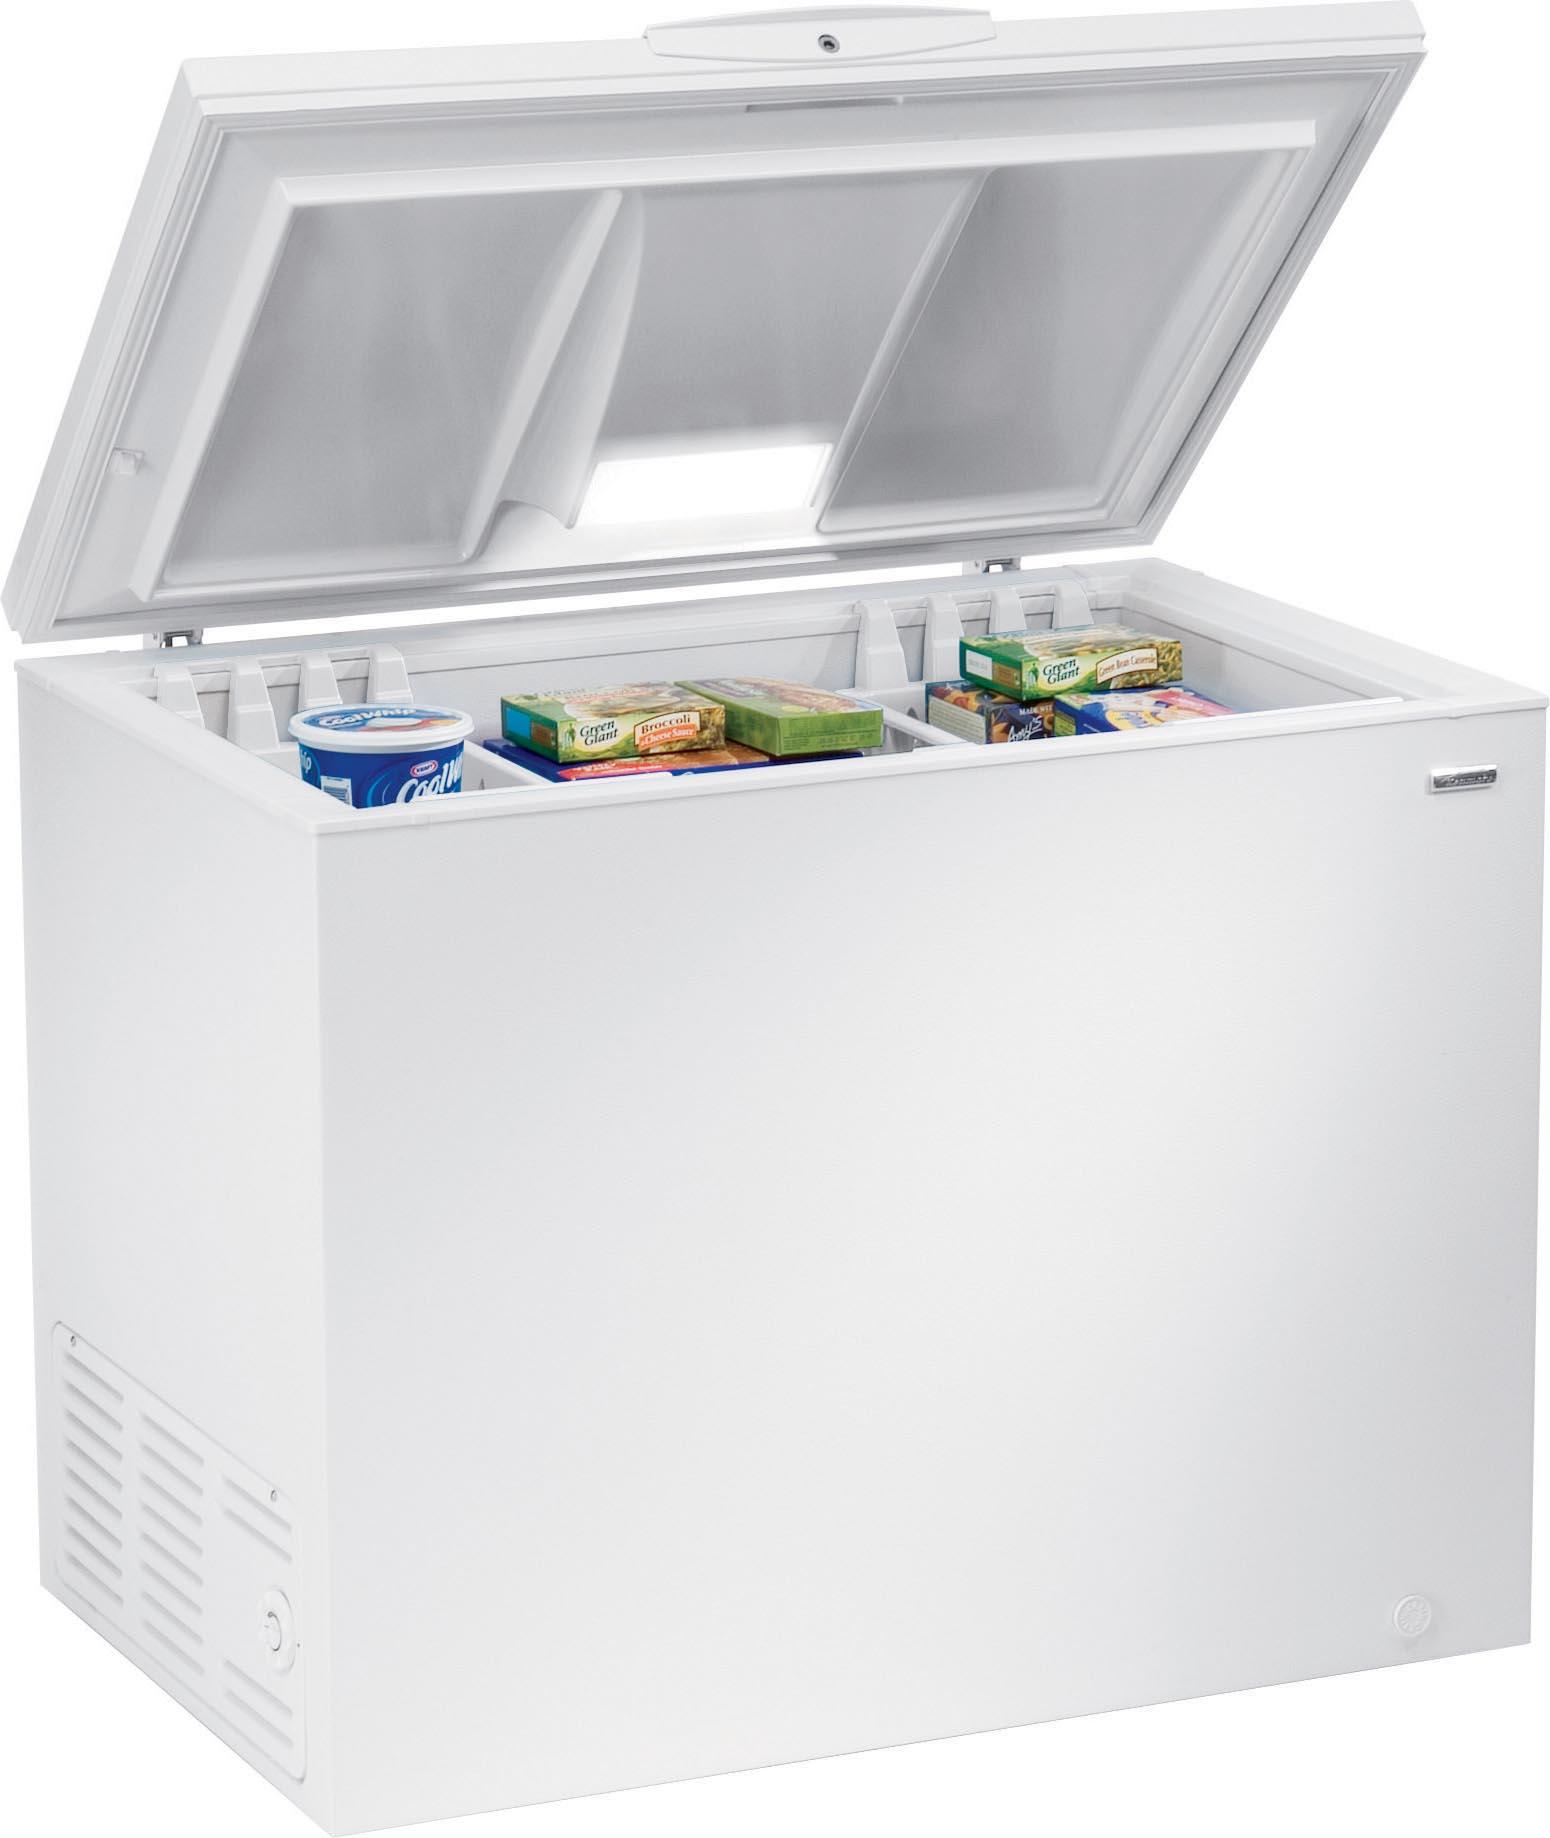 small resolution of kenmore model 25316342101 chest freezer genuine parts kenmore freezer relays diagram kenmore chest freezer wiring diagram